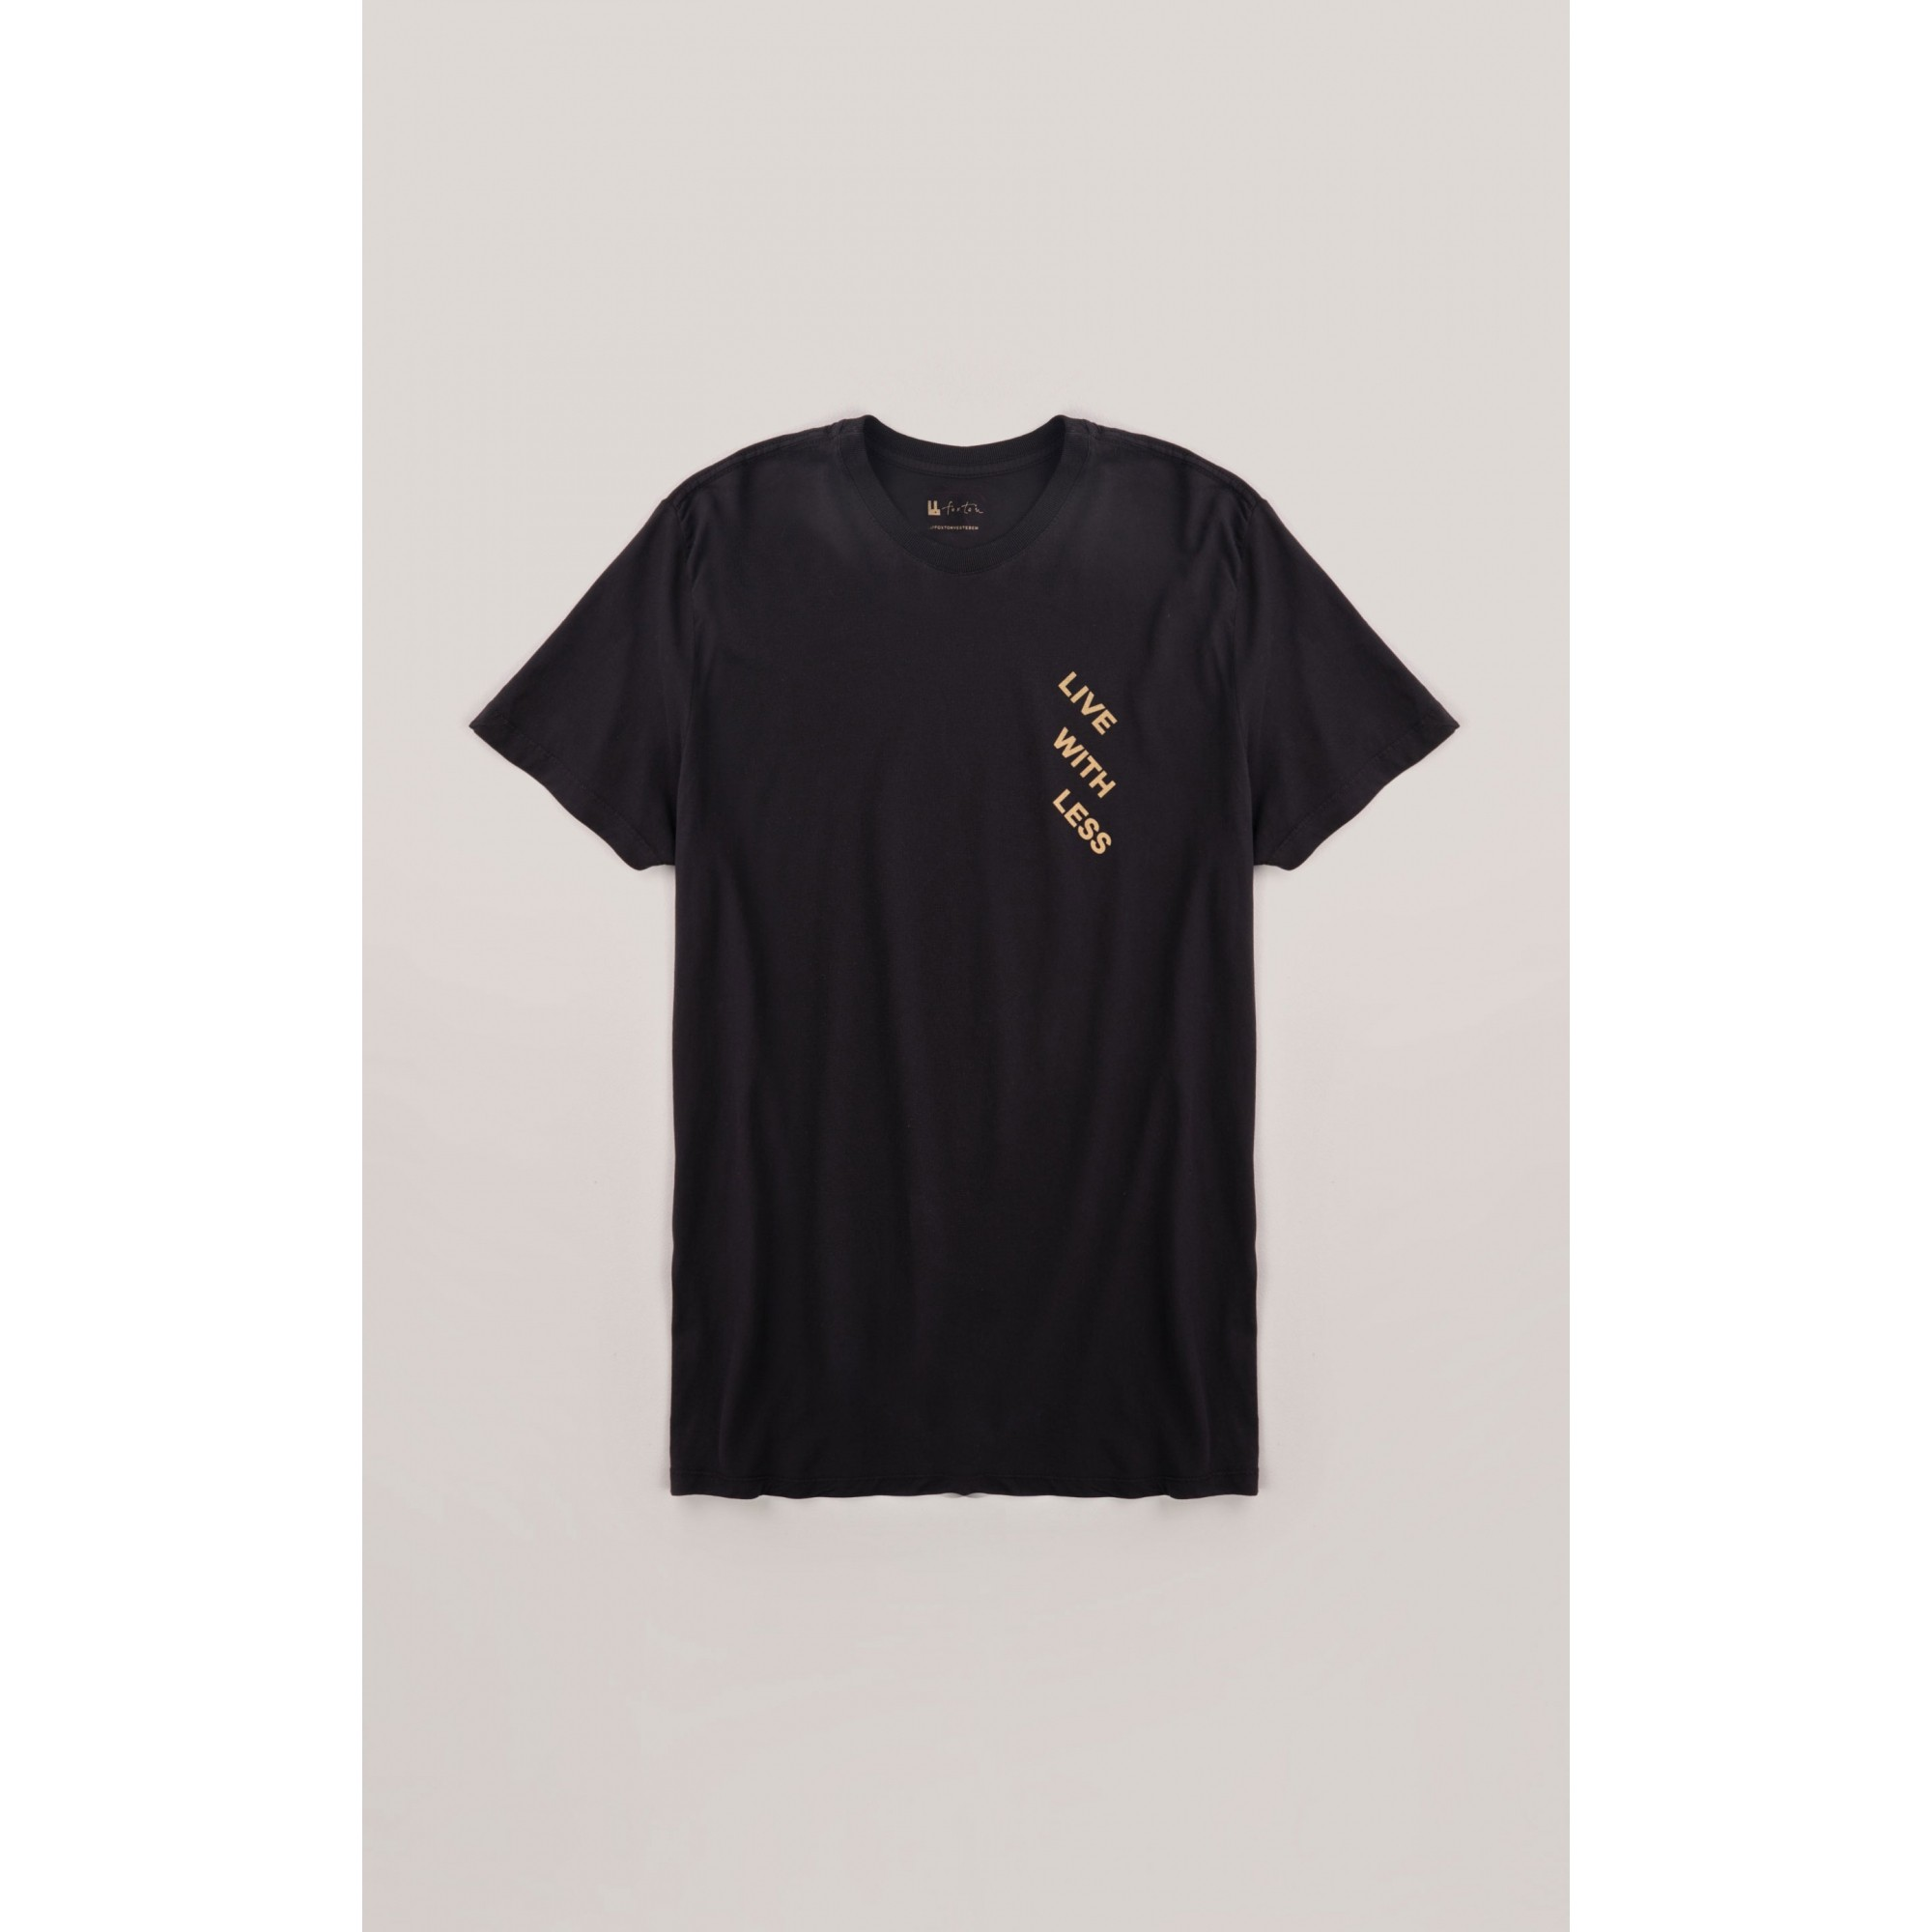 T-shirt Foxton Live Whith Less